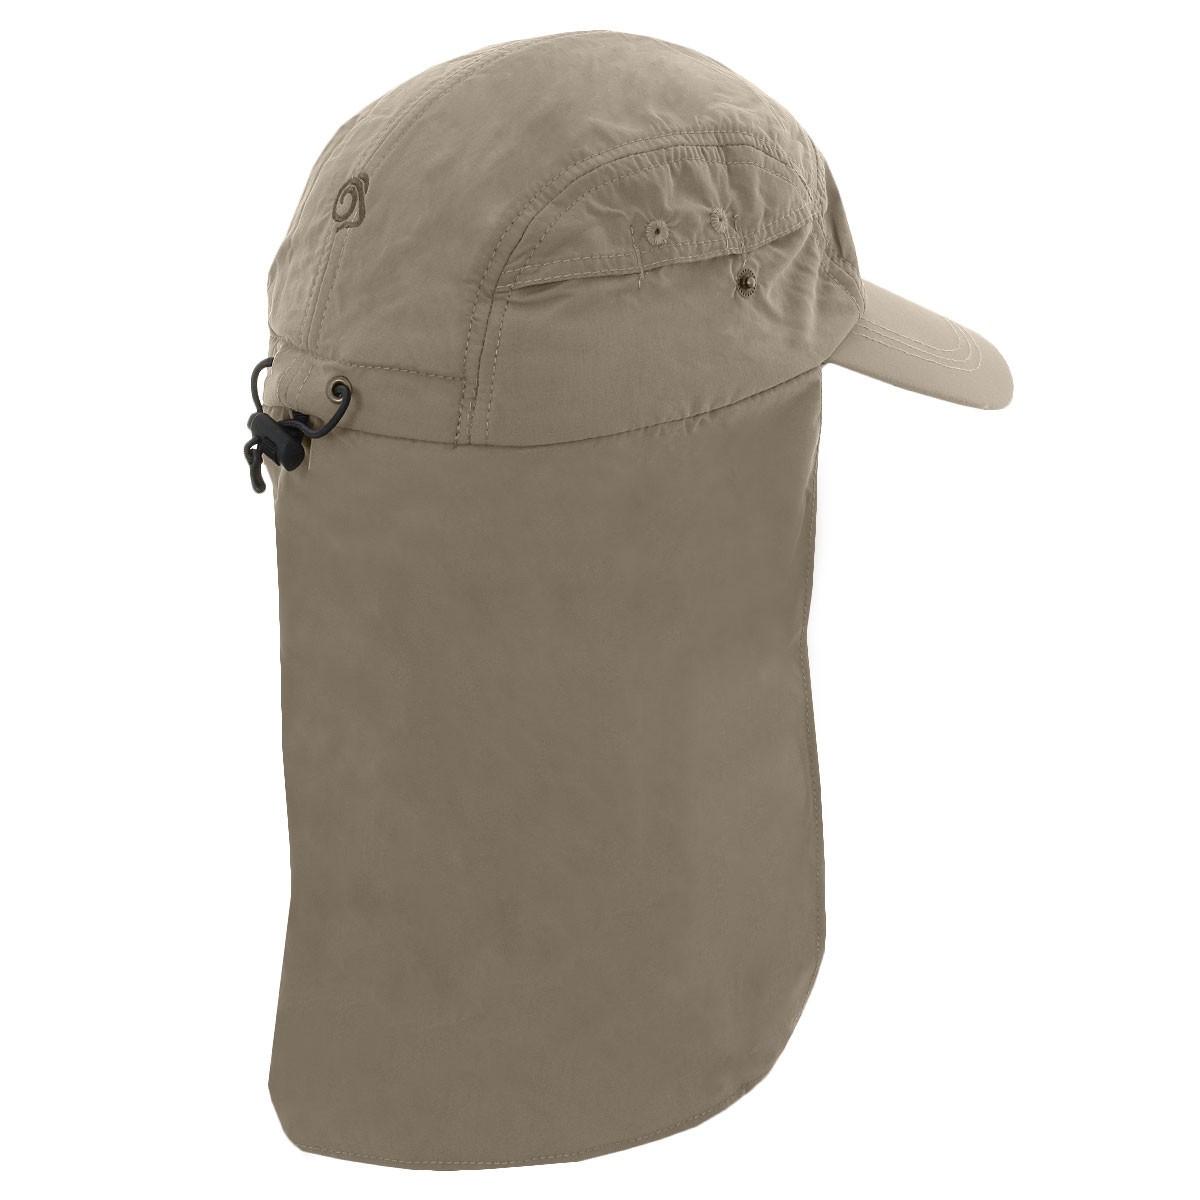 6fc7b50c3c5 Craghoppers Mens Nosilife Desert Hat Insect Repellent Accessories